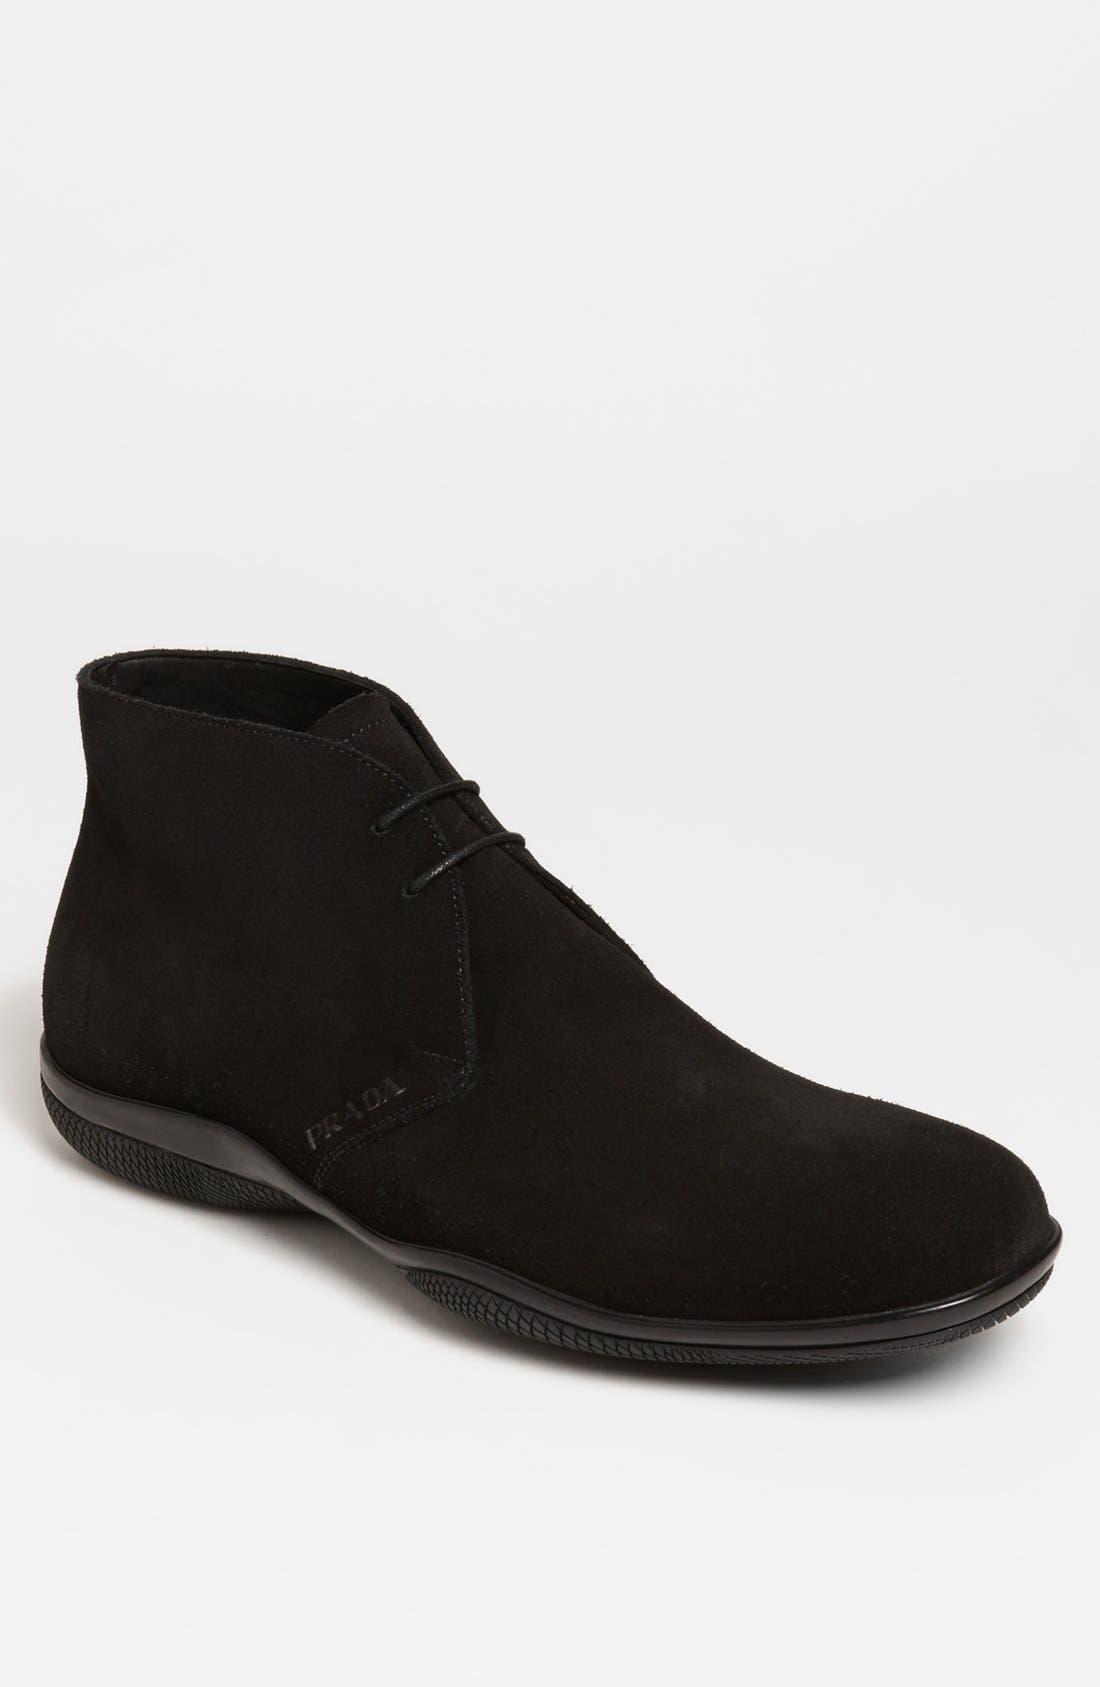 Alternate Image 1 Selected - Prada 'Toblac' Chukka Boot